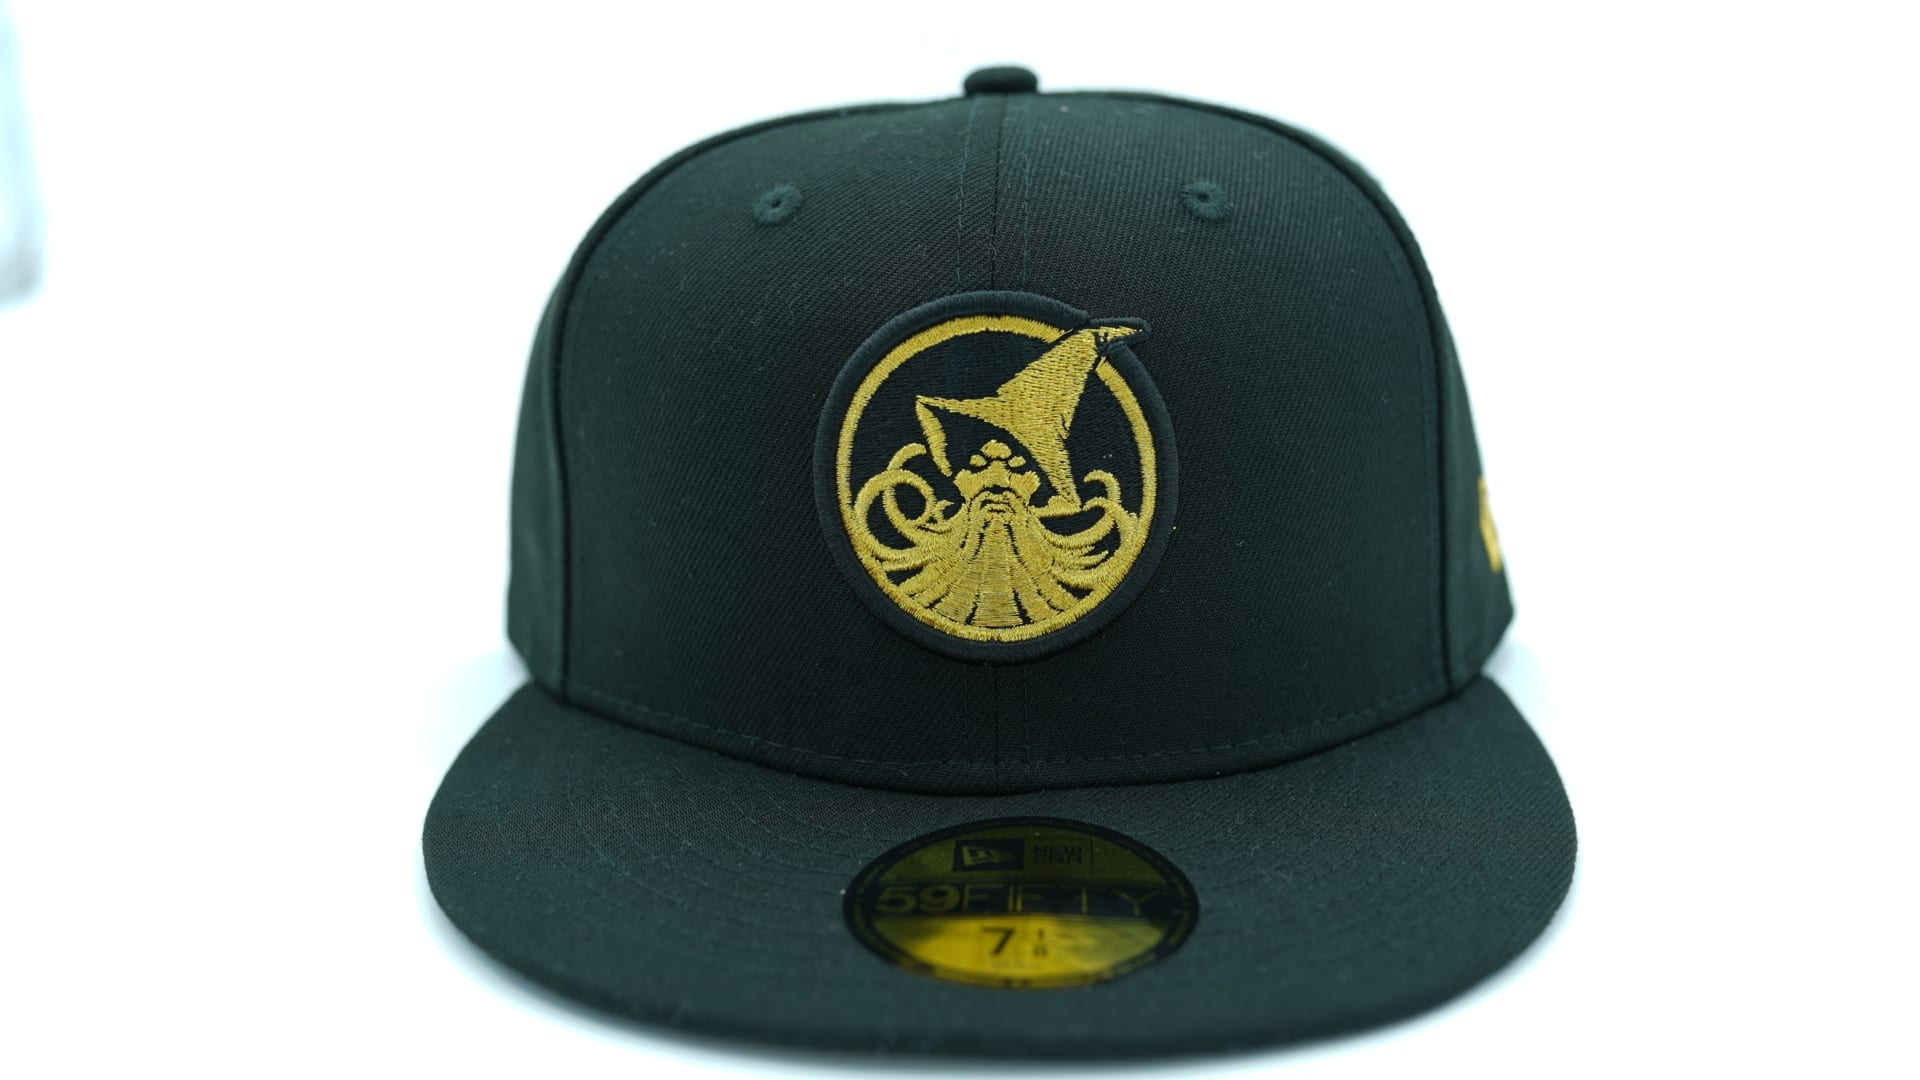 47-BRAND-MLB-fitted-baseball-cap-hat-giants.   6bca685783b